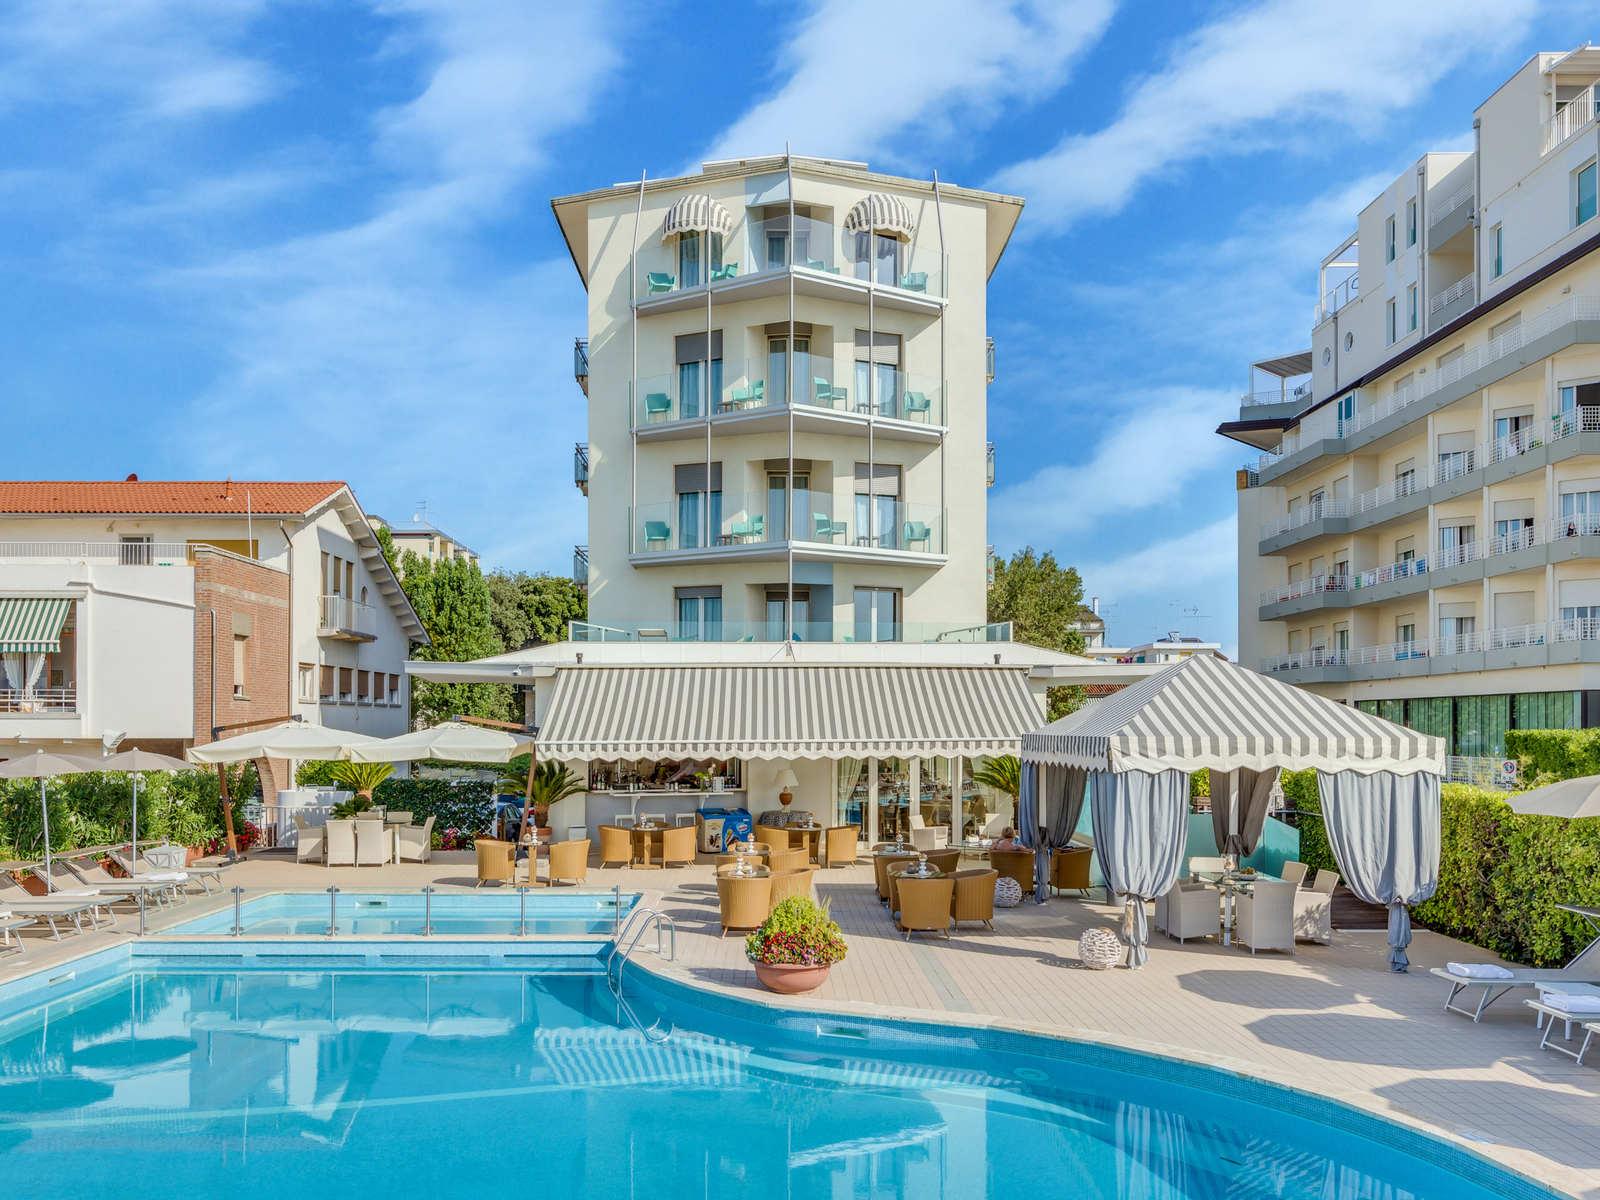 Hotel delle mimose jesolo hotel reservation hotel 3 for 3 stelle arreda beinasco